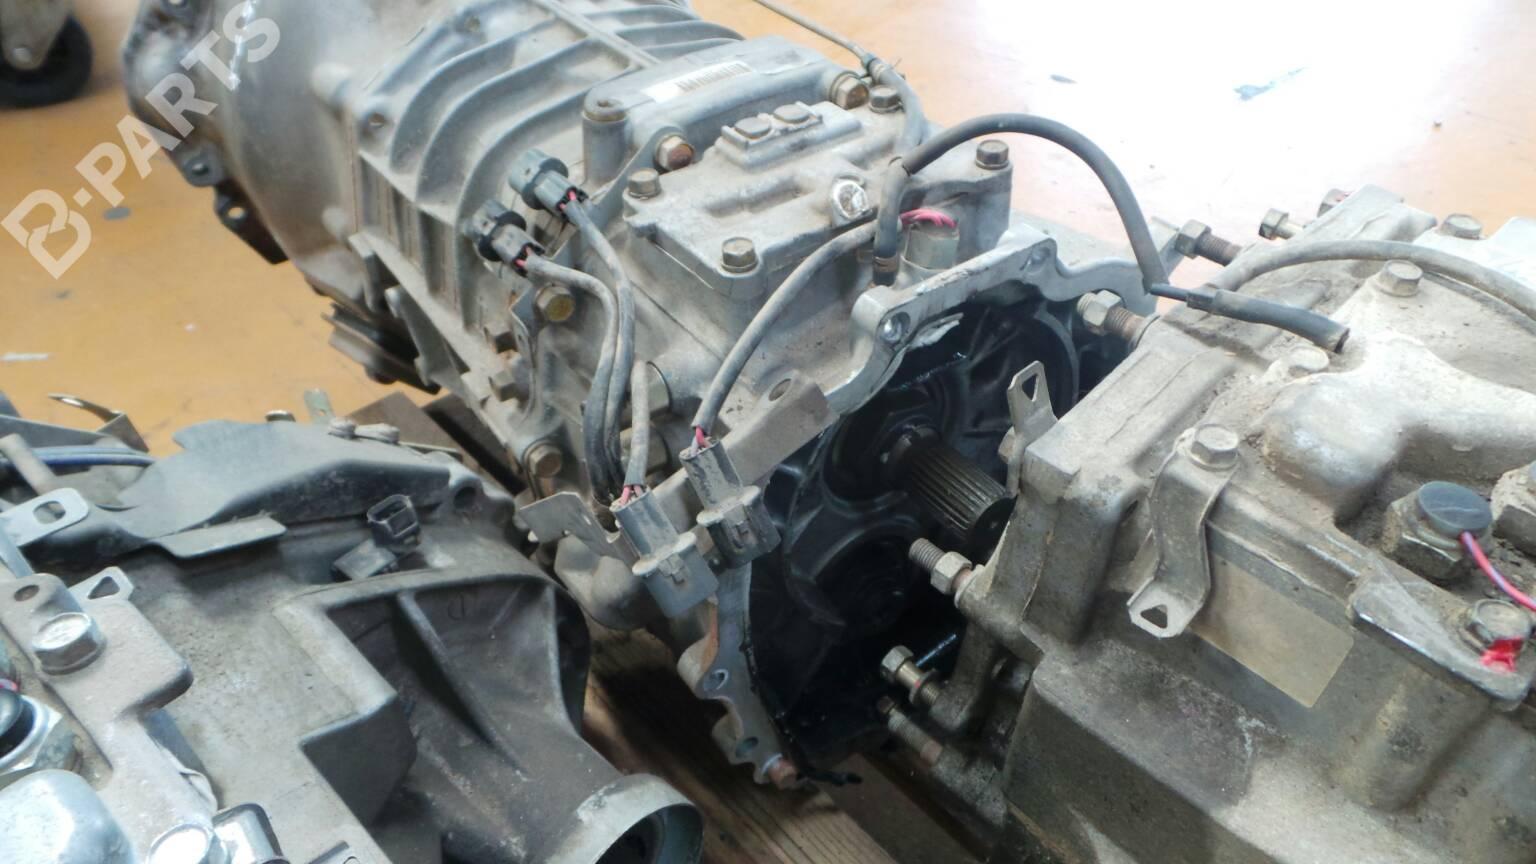 manual gearbox mitsubishi pajero iii v7 w v6 w 3 2 di d 27778 rh b parts com Mitsubishi Outlander Mitsubishi Outlander